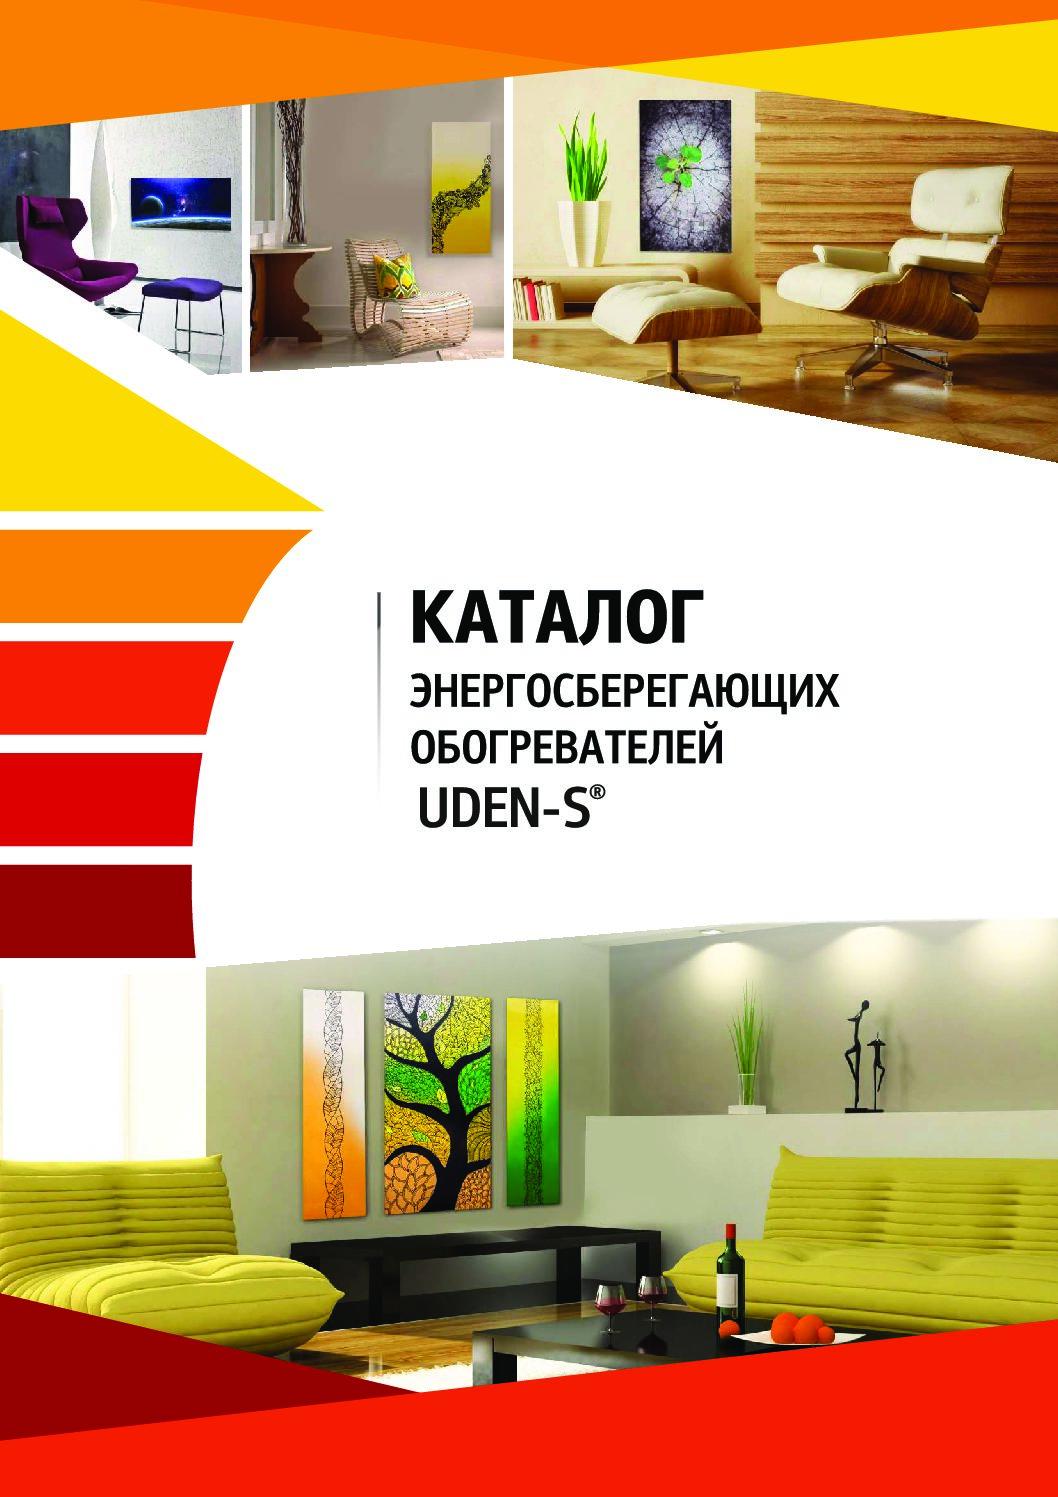 katalog_UDEN-S